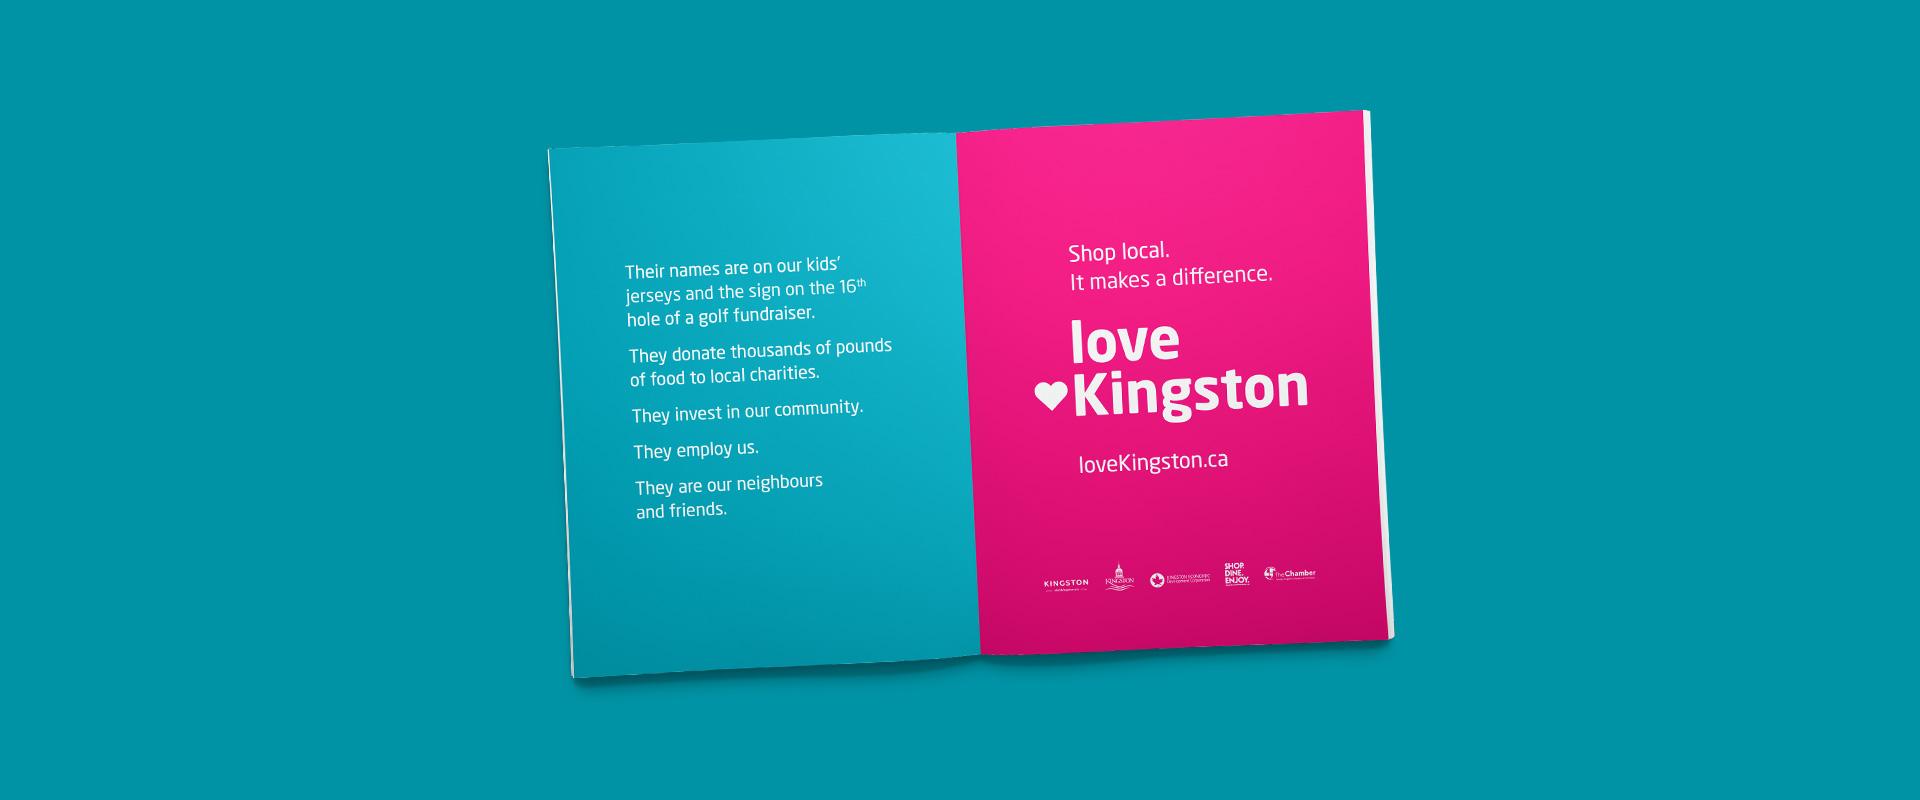 love-kingston-ads-3